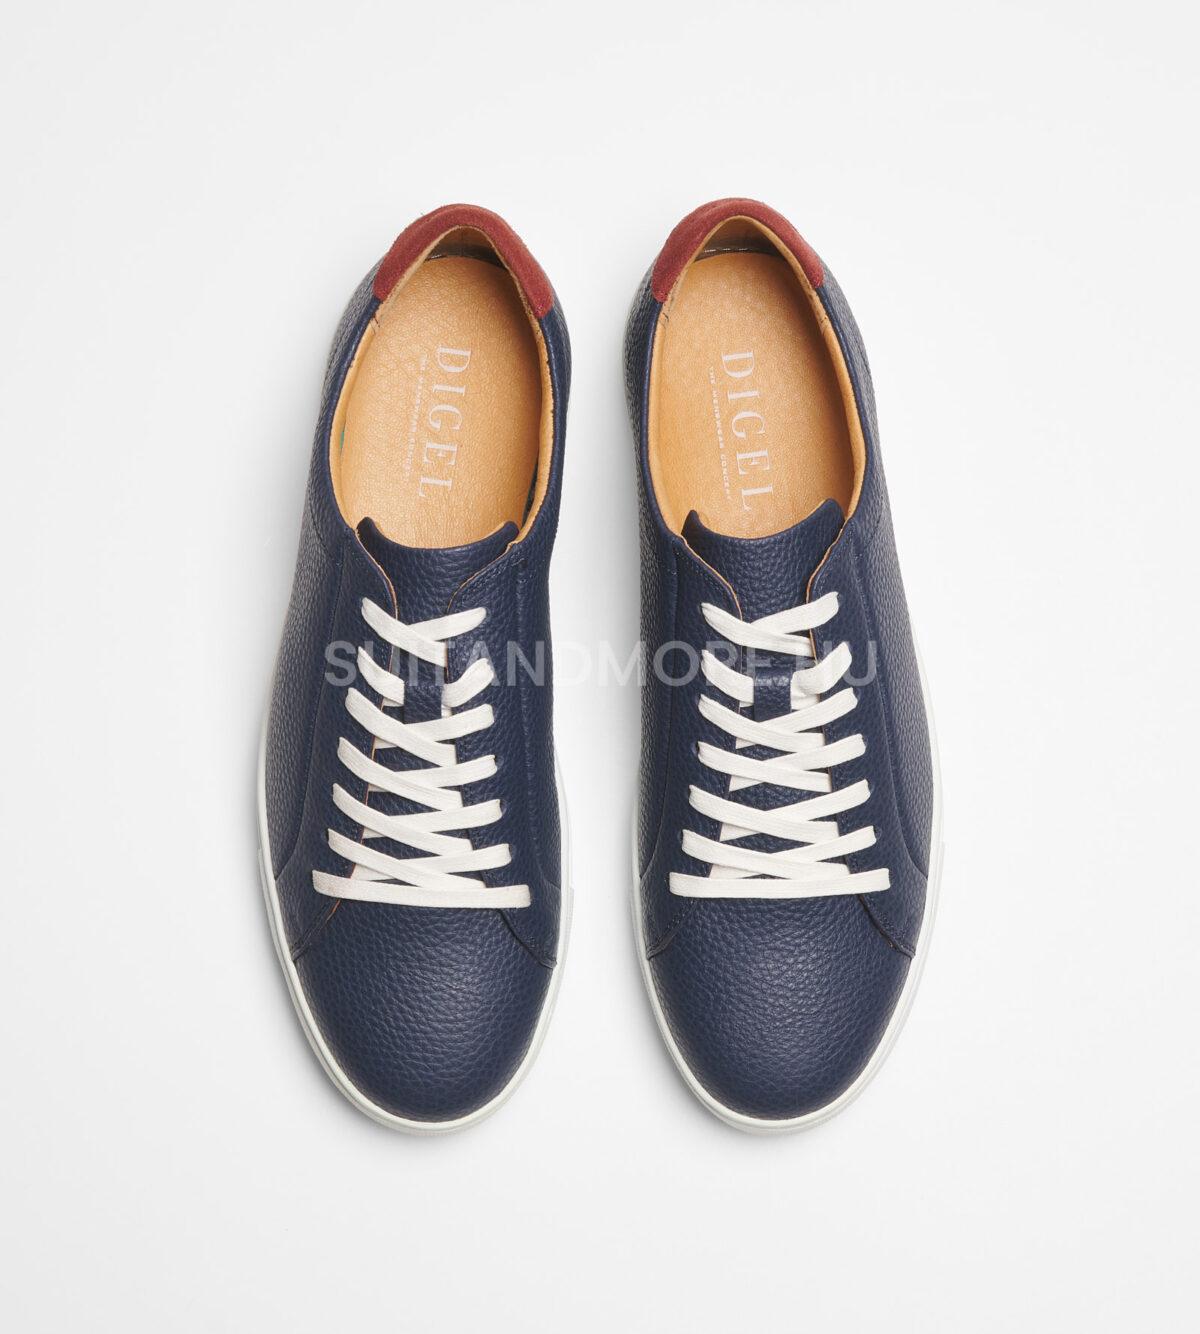 digel-kek-sneaker-cipo-seth-1289704-20-04